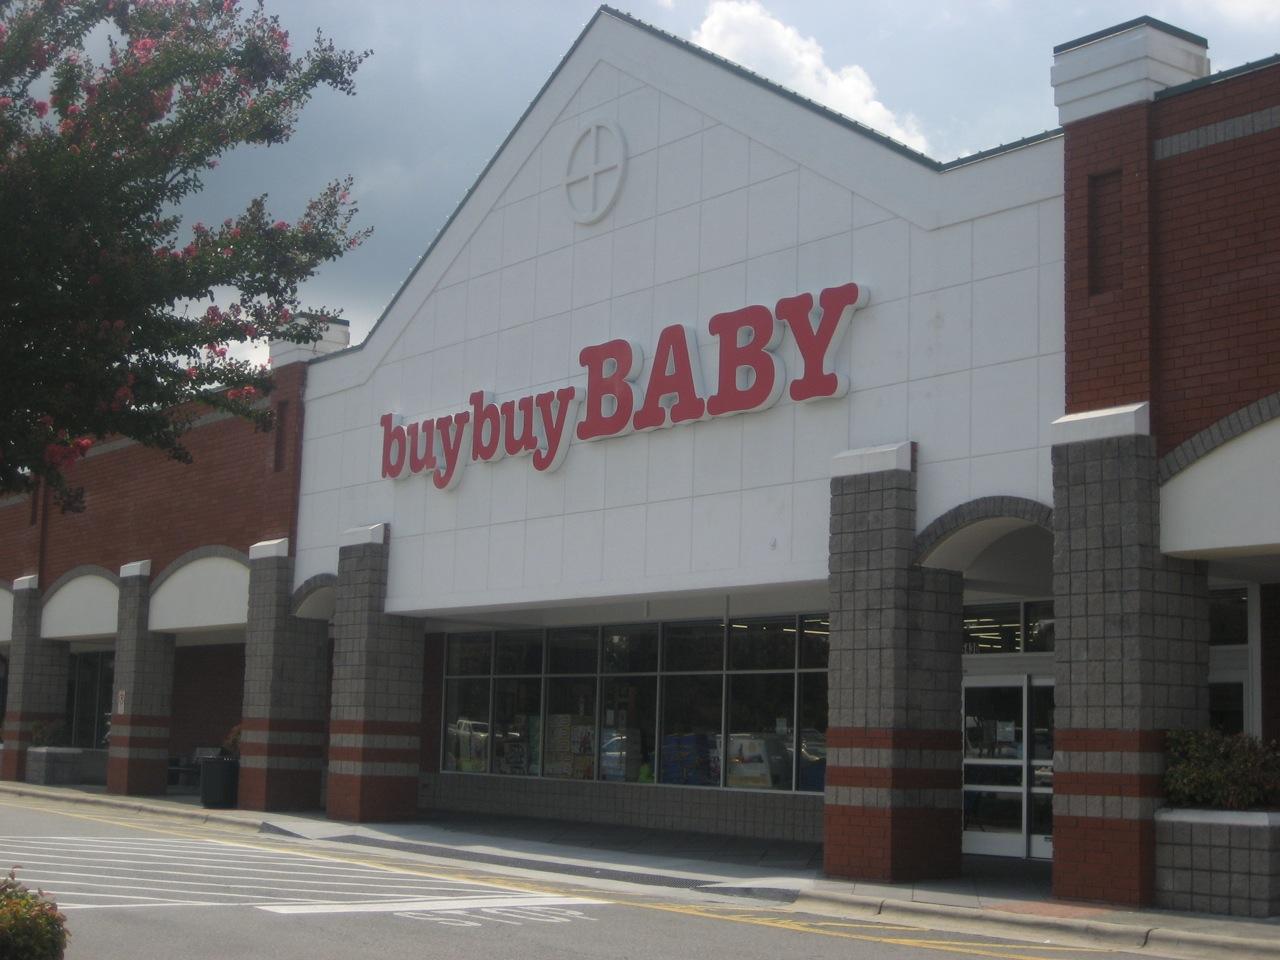 Baby cribs buy buy baby - Babies R Us Vs Buy Buy Baby